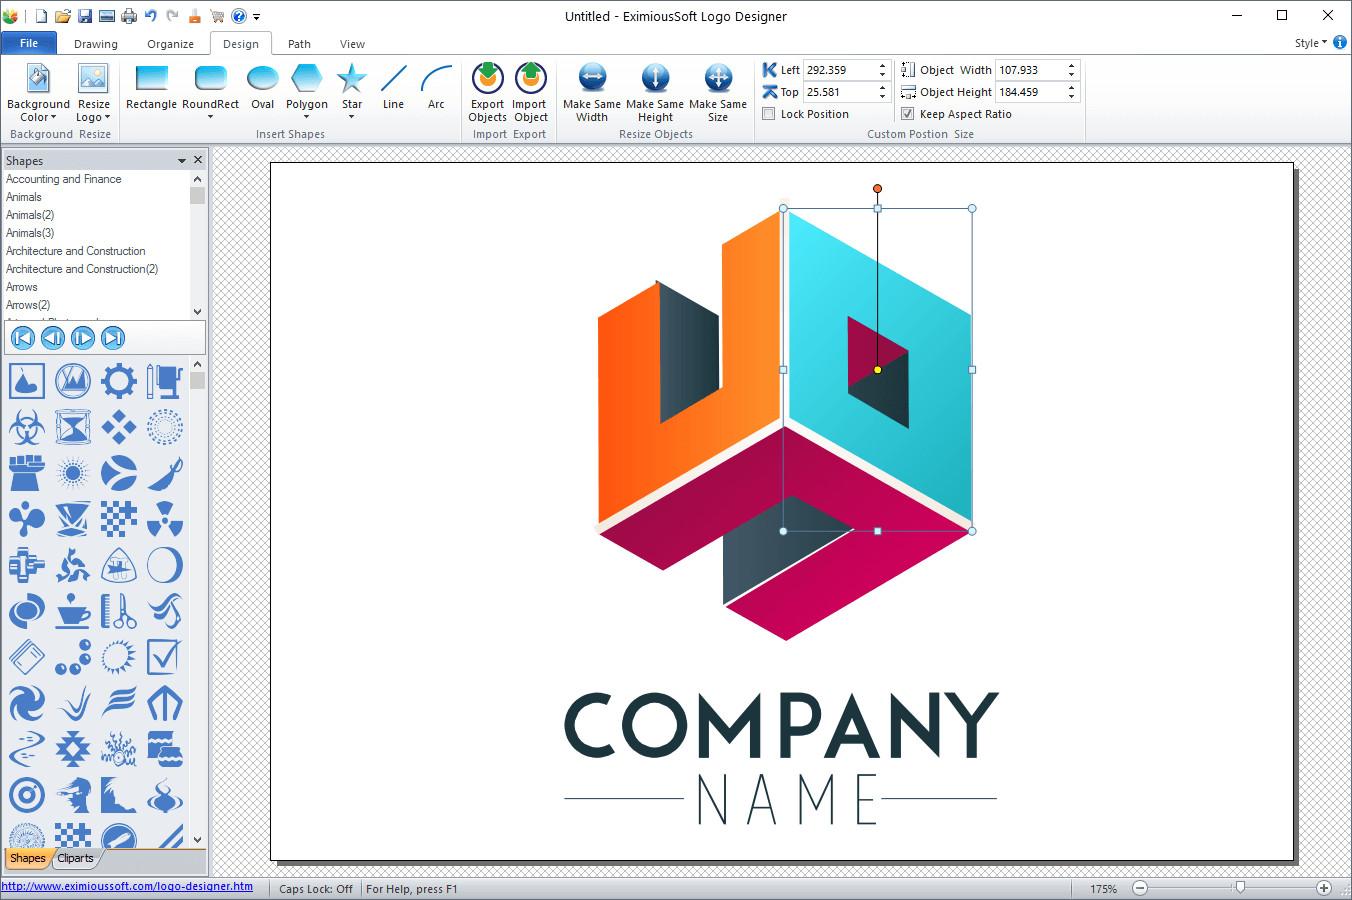 Eximioussoft logo designer pro neowin for What program to use to design a logo